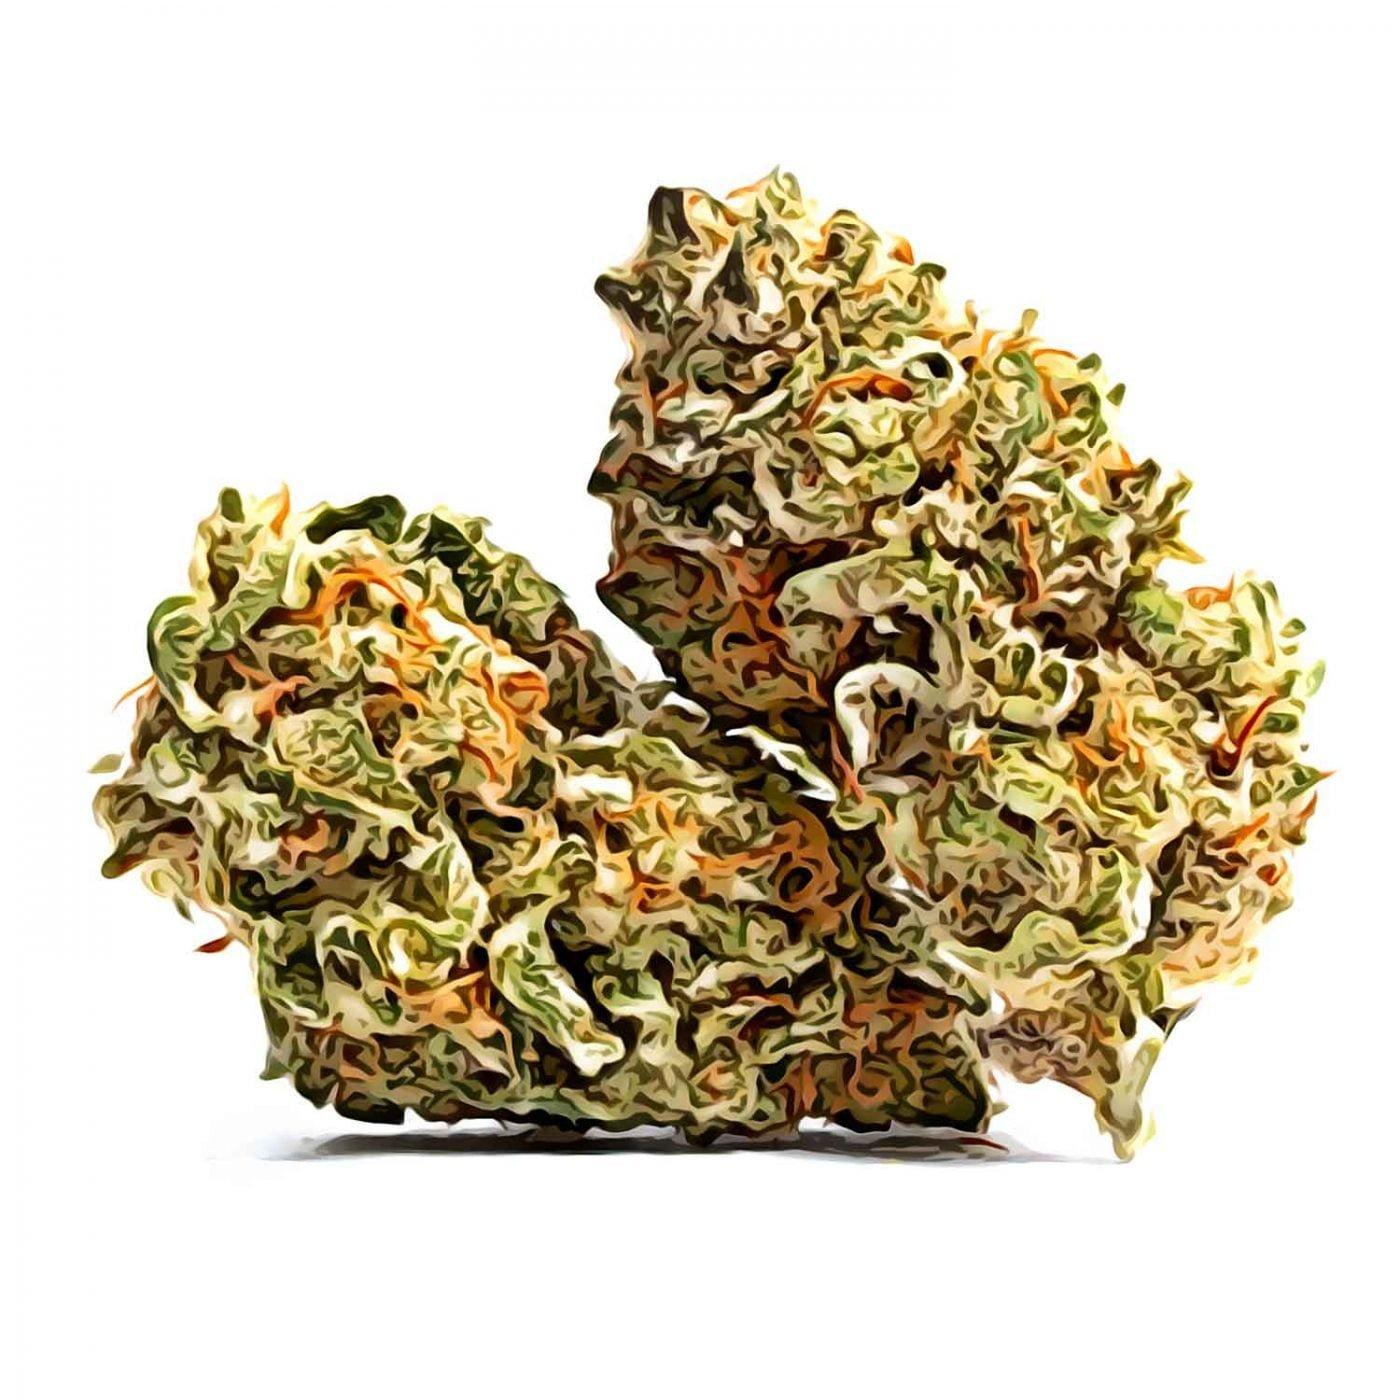 Cleopatra CBD cannabis strain